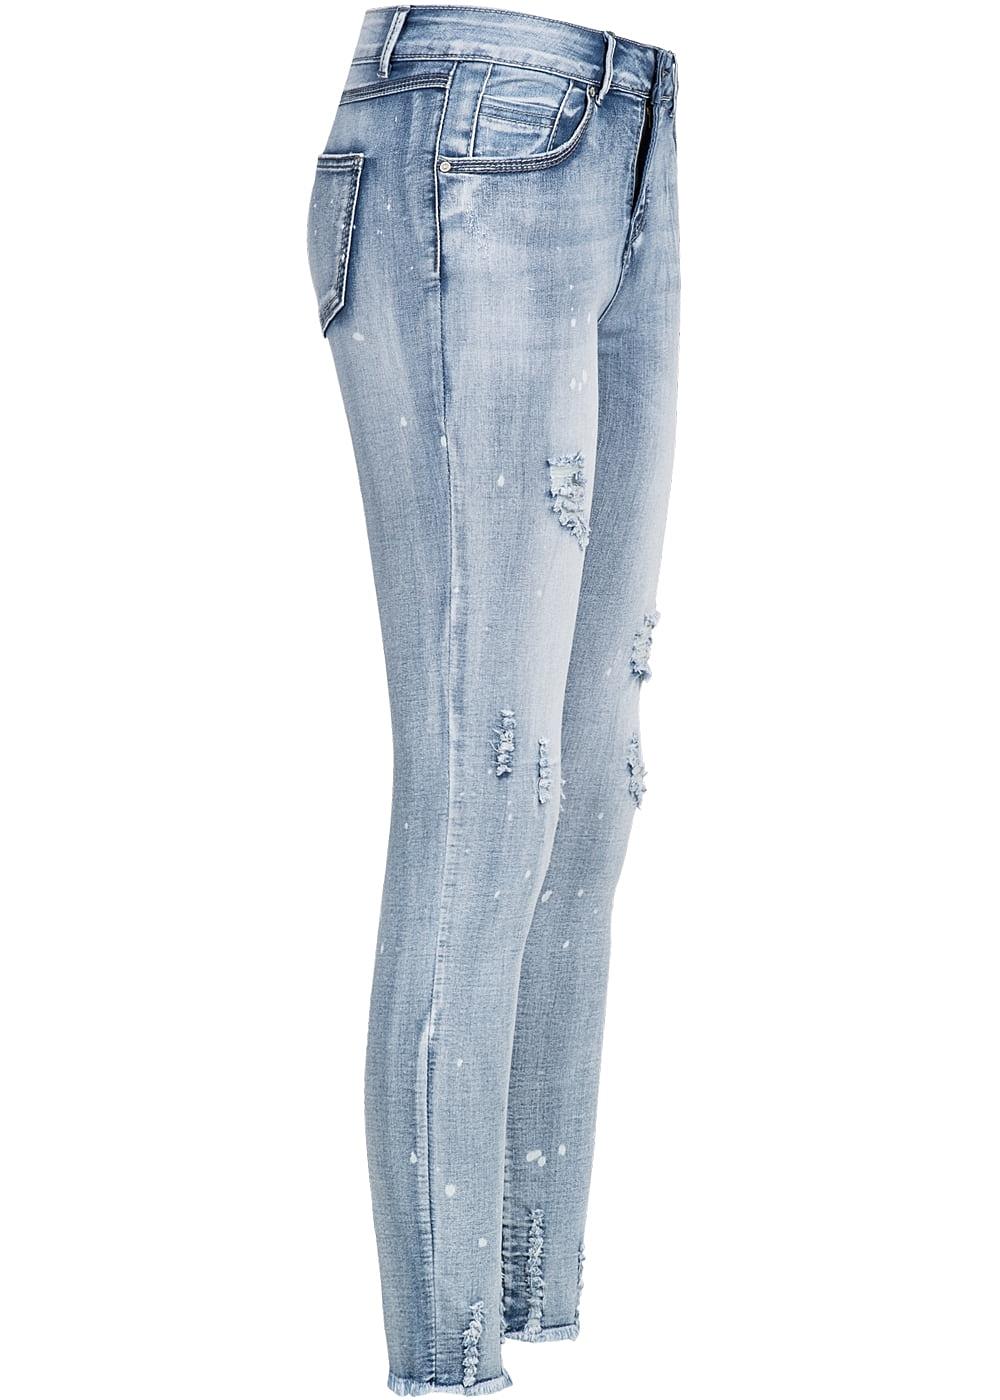 seventyseven lifestyle hose damen jeans flecken muster detroy look hell blau denim - Jeans Mit Muster